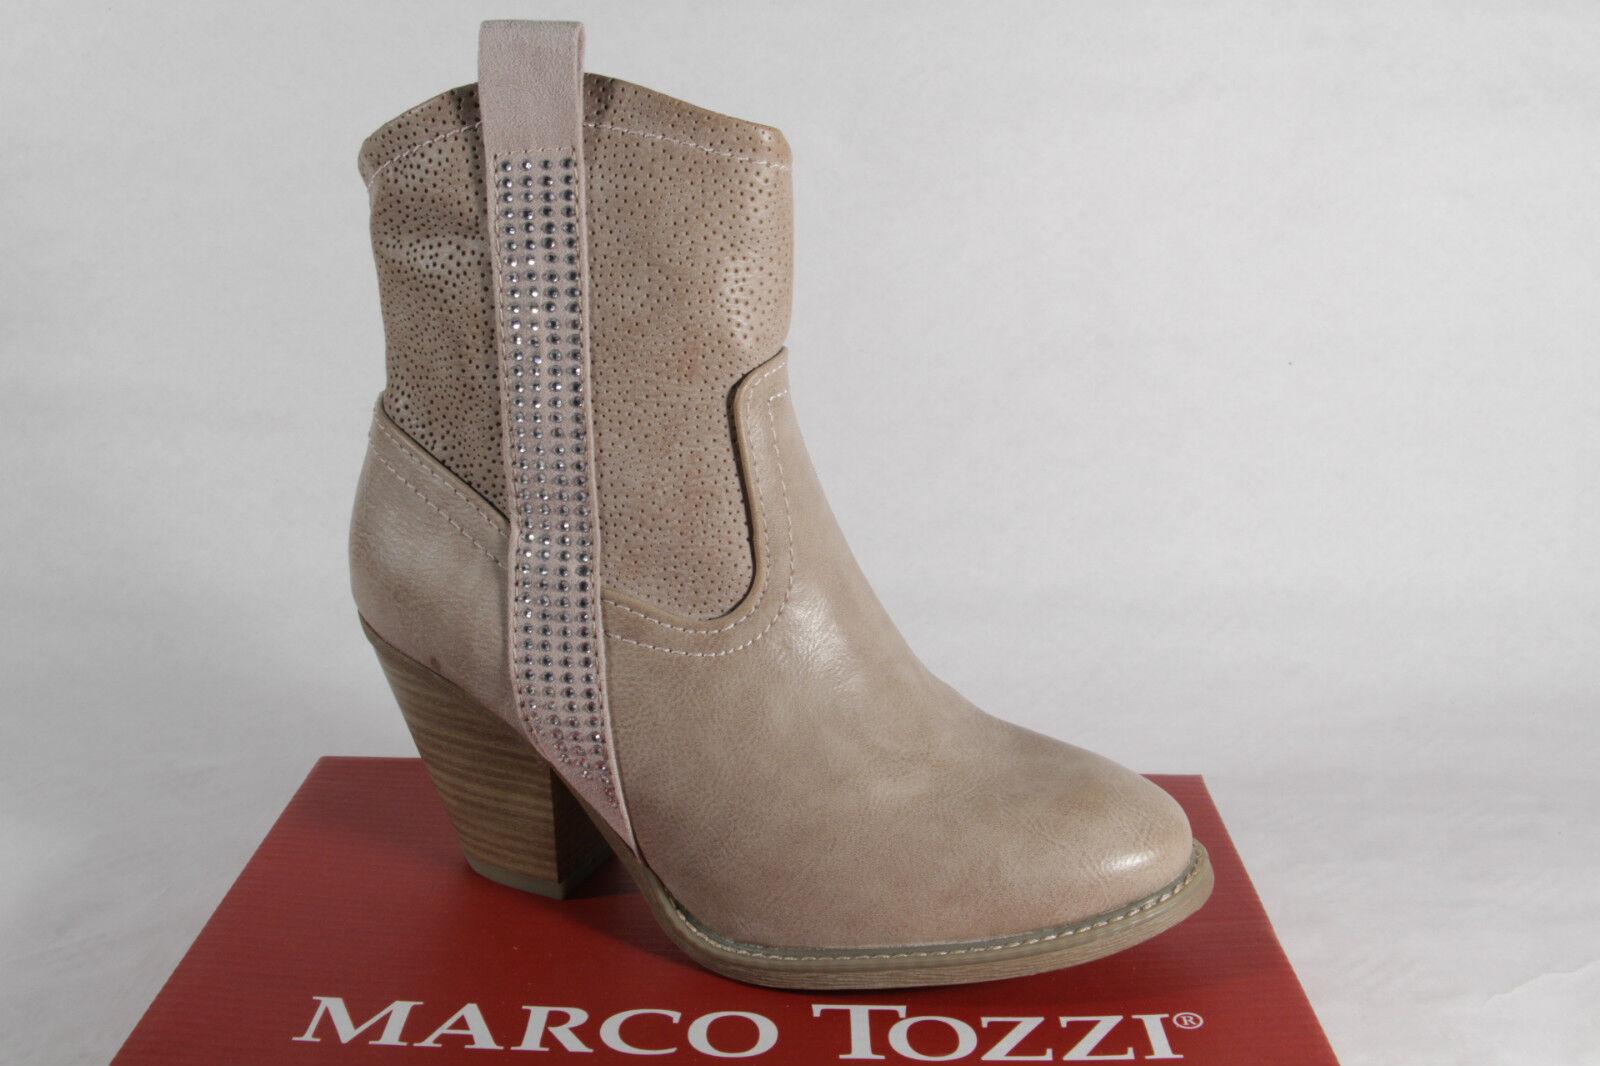 MARCO TOZZI Bottes, bottines, bottes simili-cuir beige, fermeture éclair NEUF